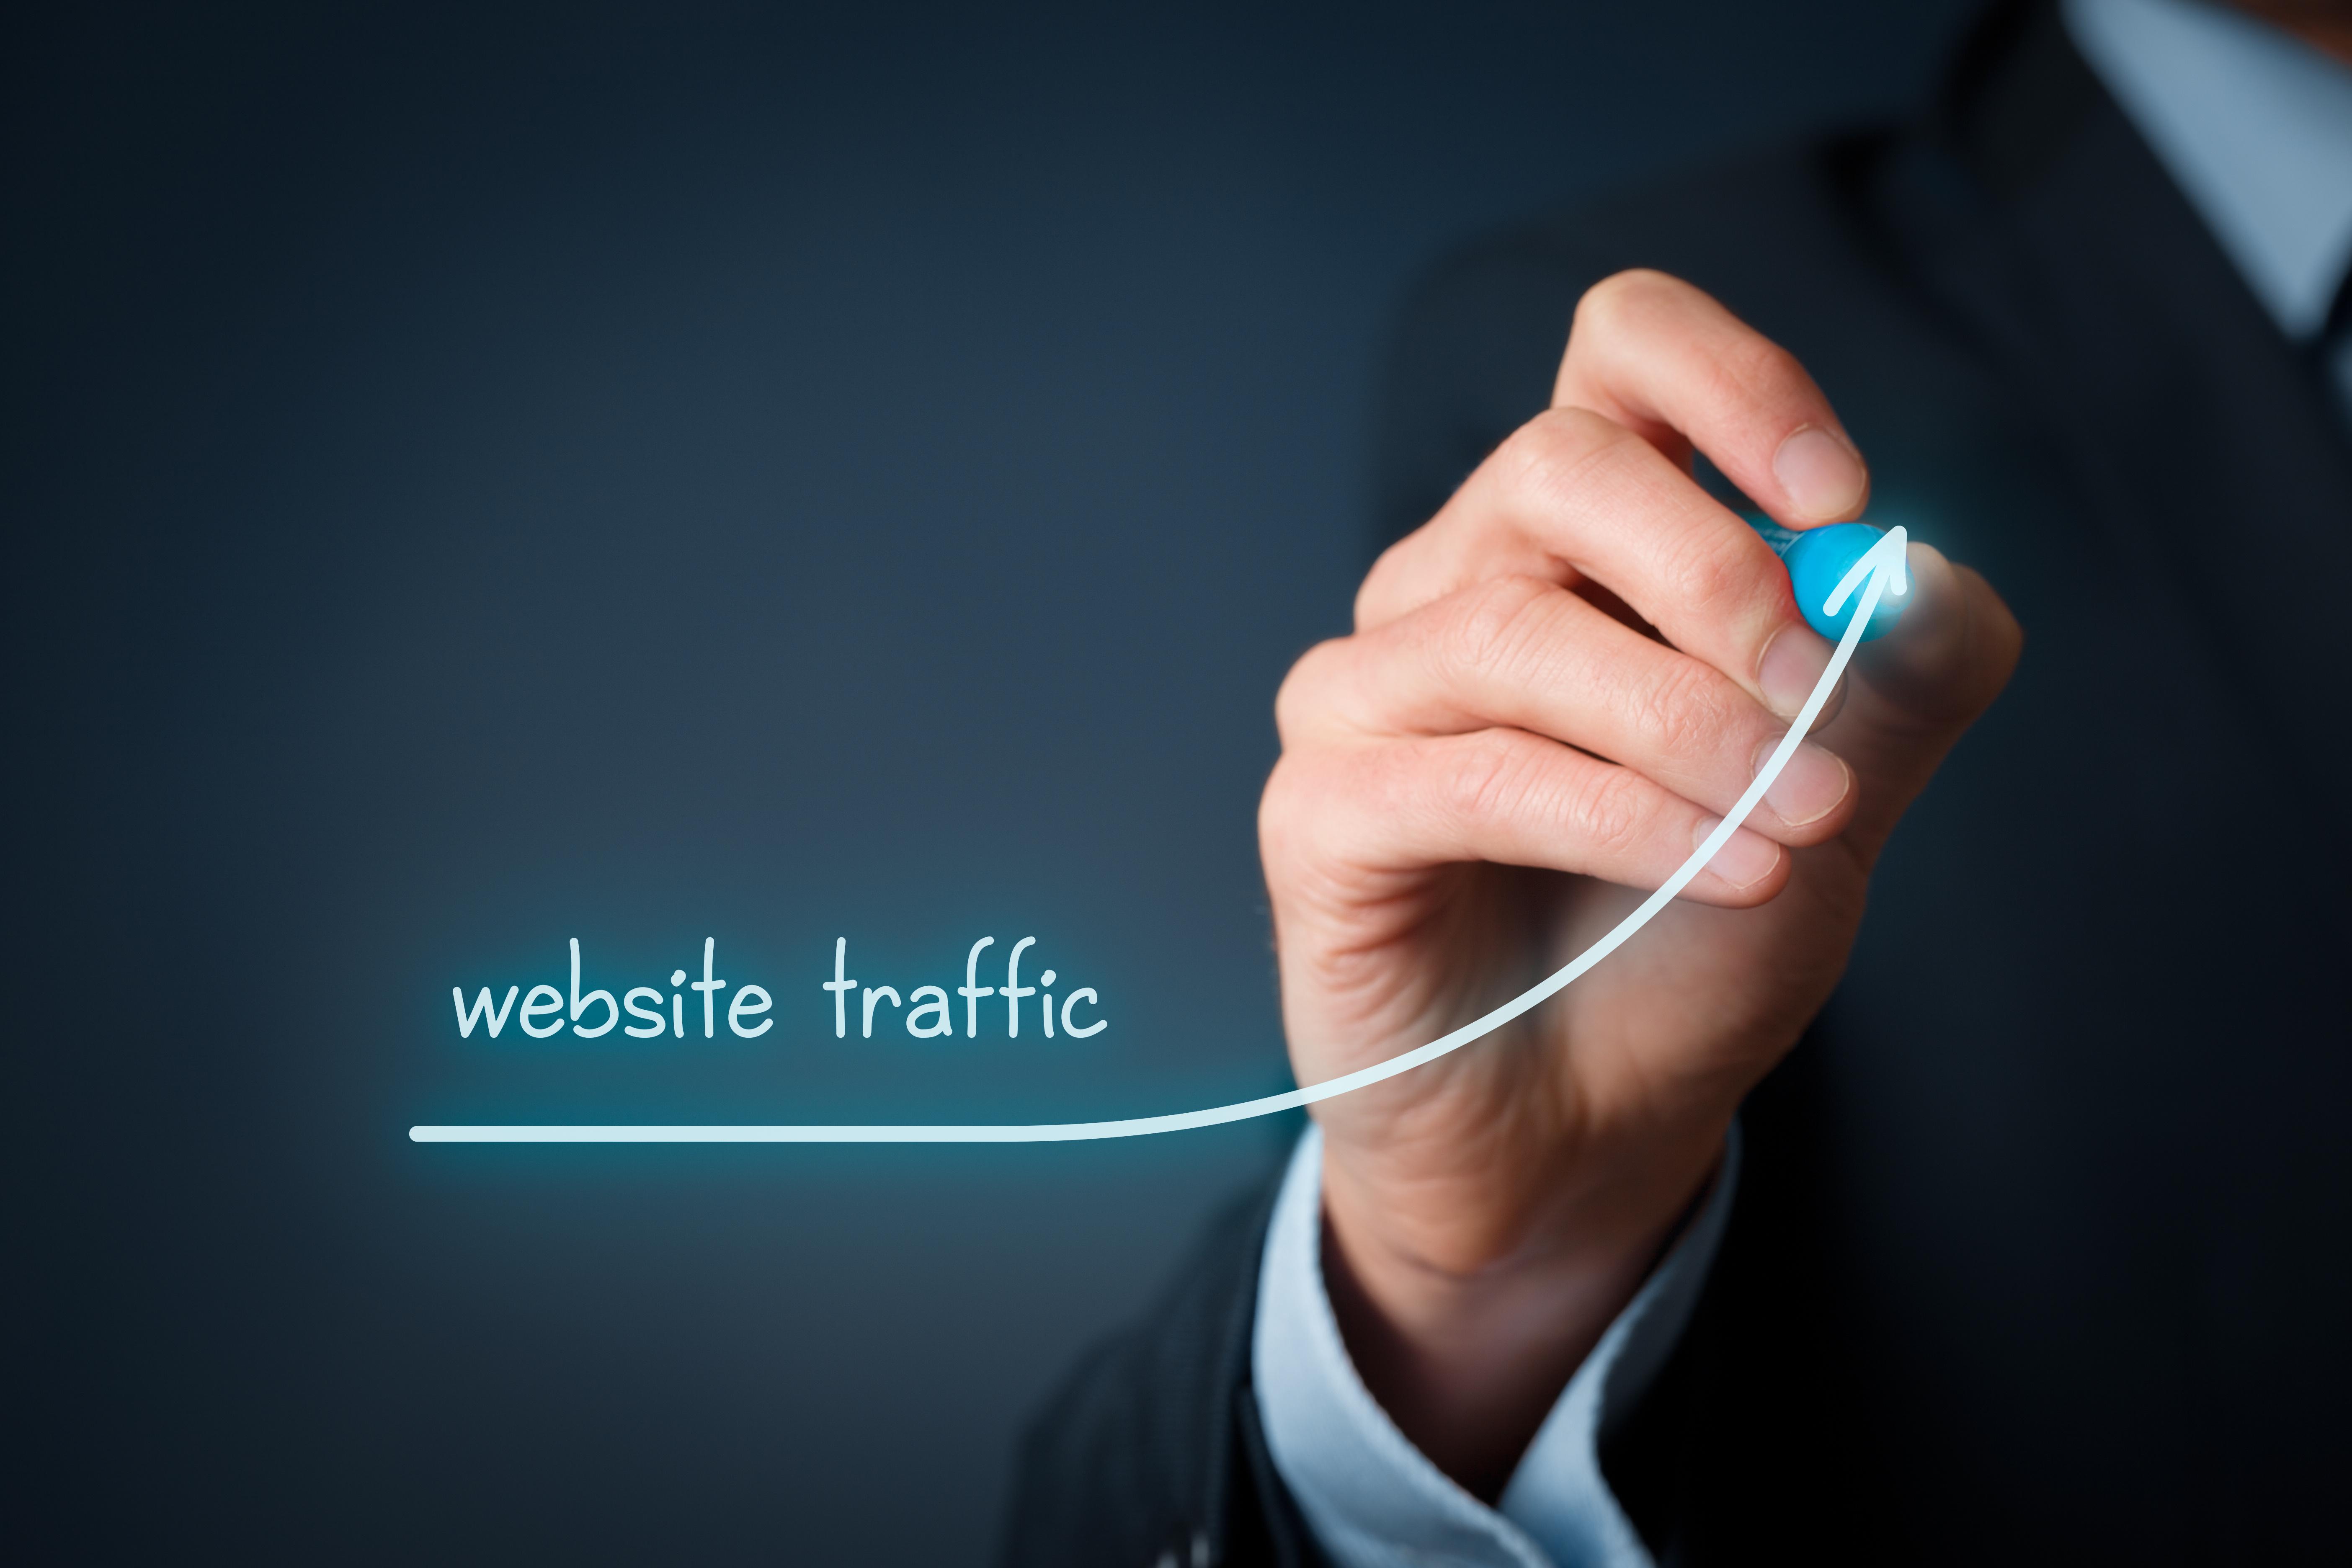 Six strategies for increasing website traffic